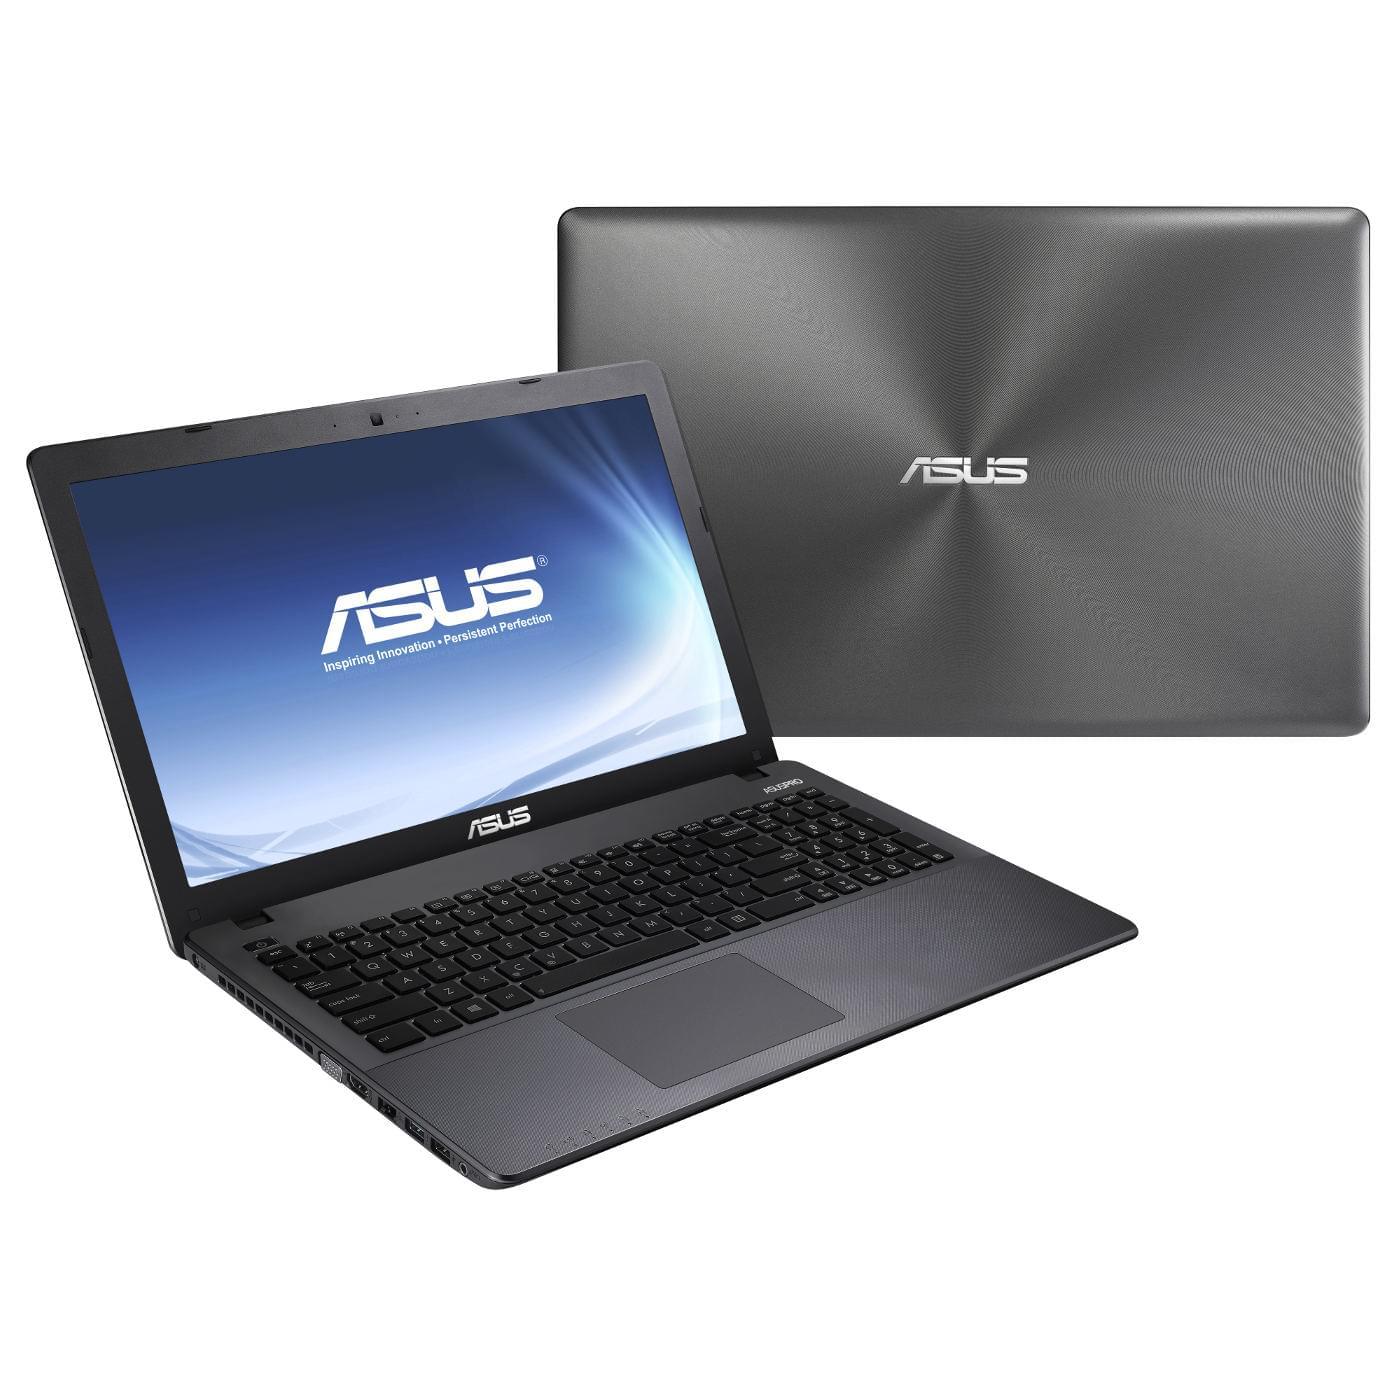 Asus P550LAV-XO1035G - PC portable Asus - Cybertek.fr - 0